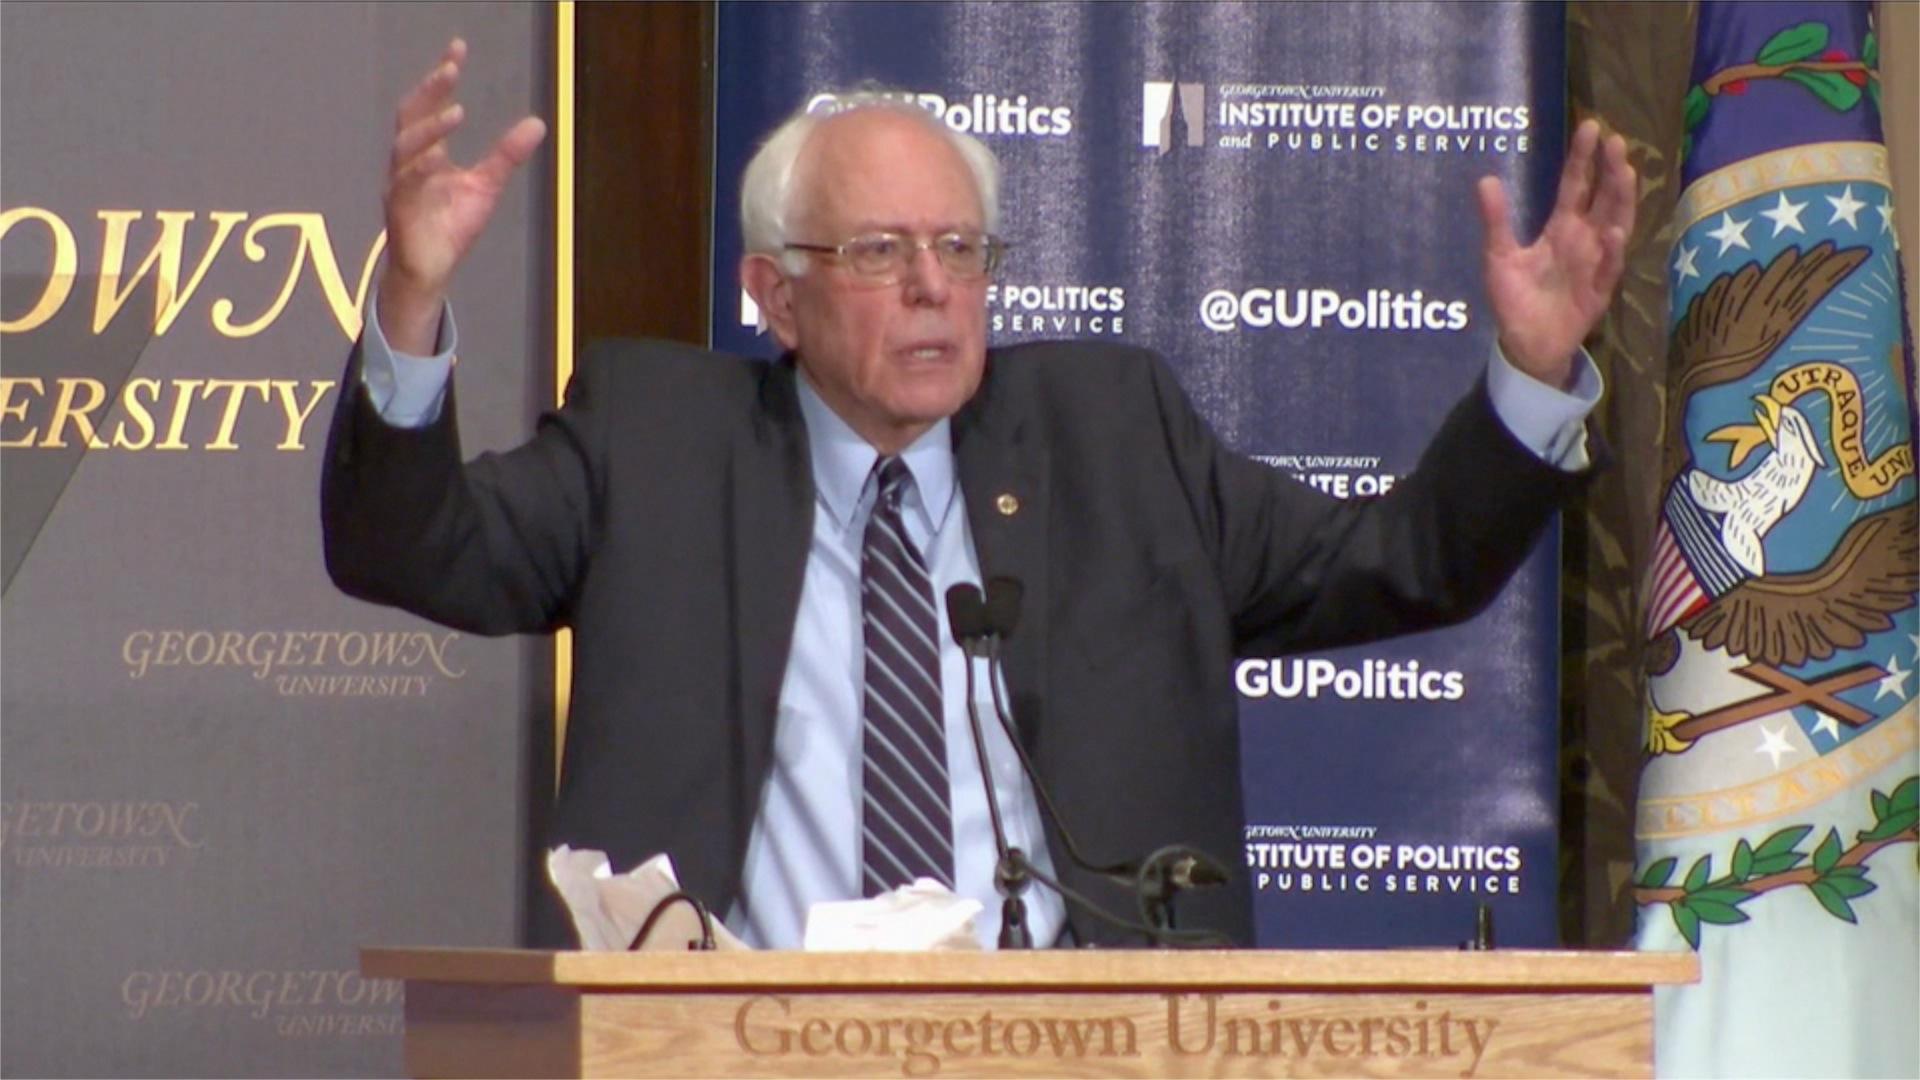 Sanders: Unlike Clinton, I won't seek 'reckless adventures abroad'